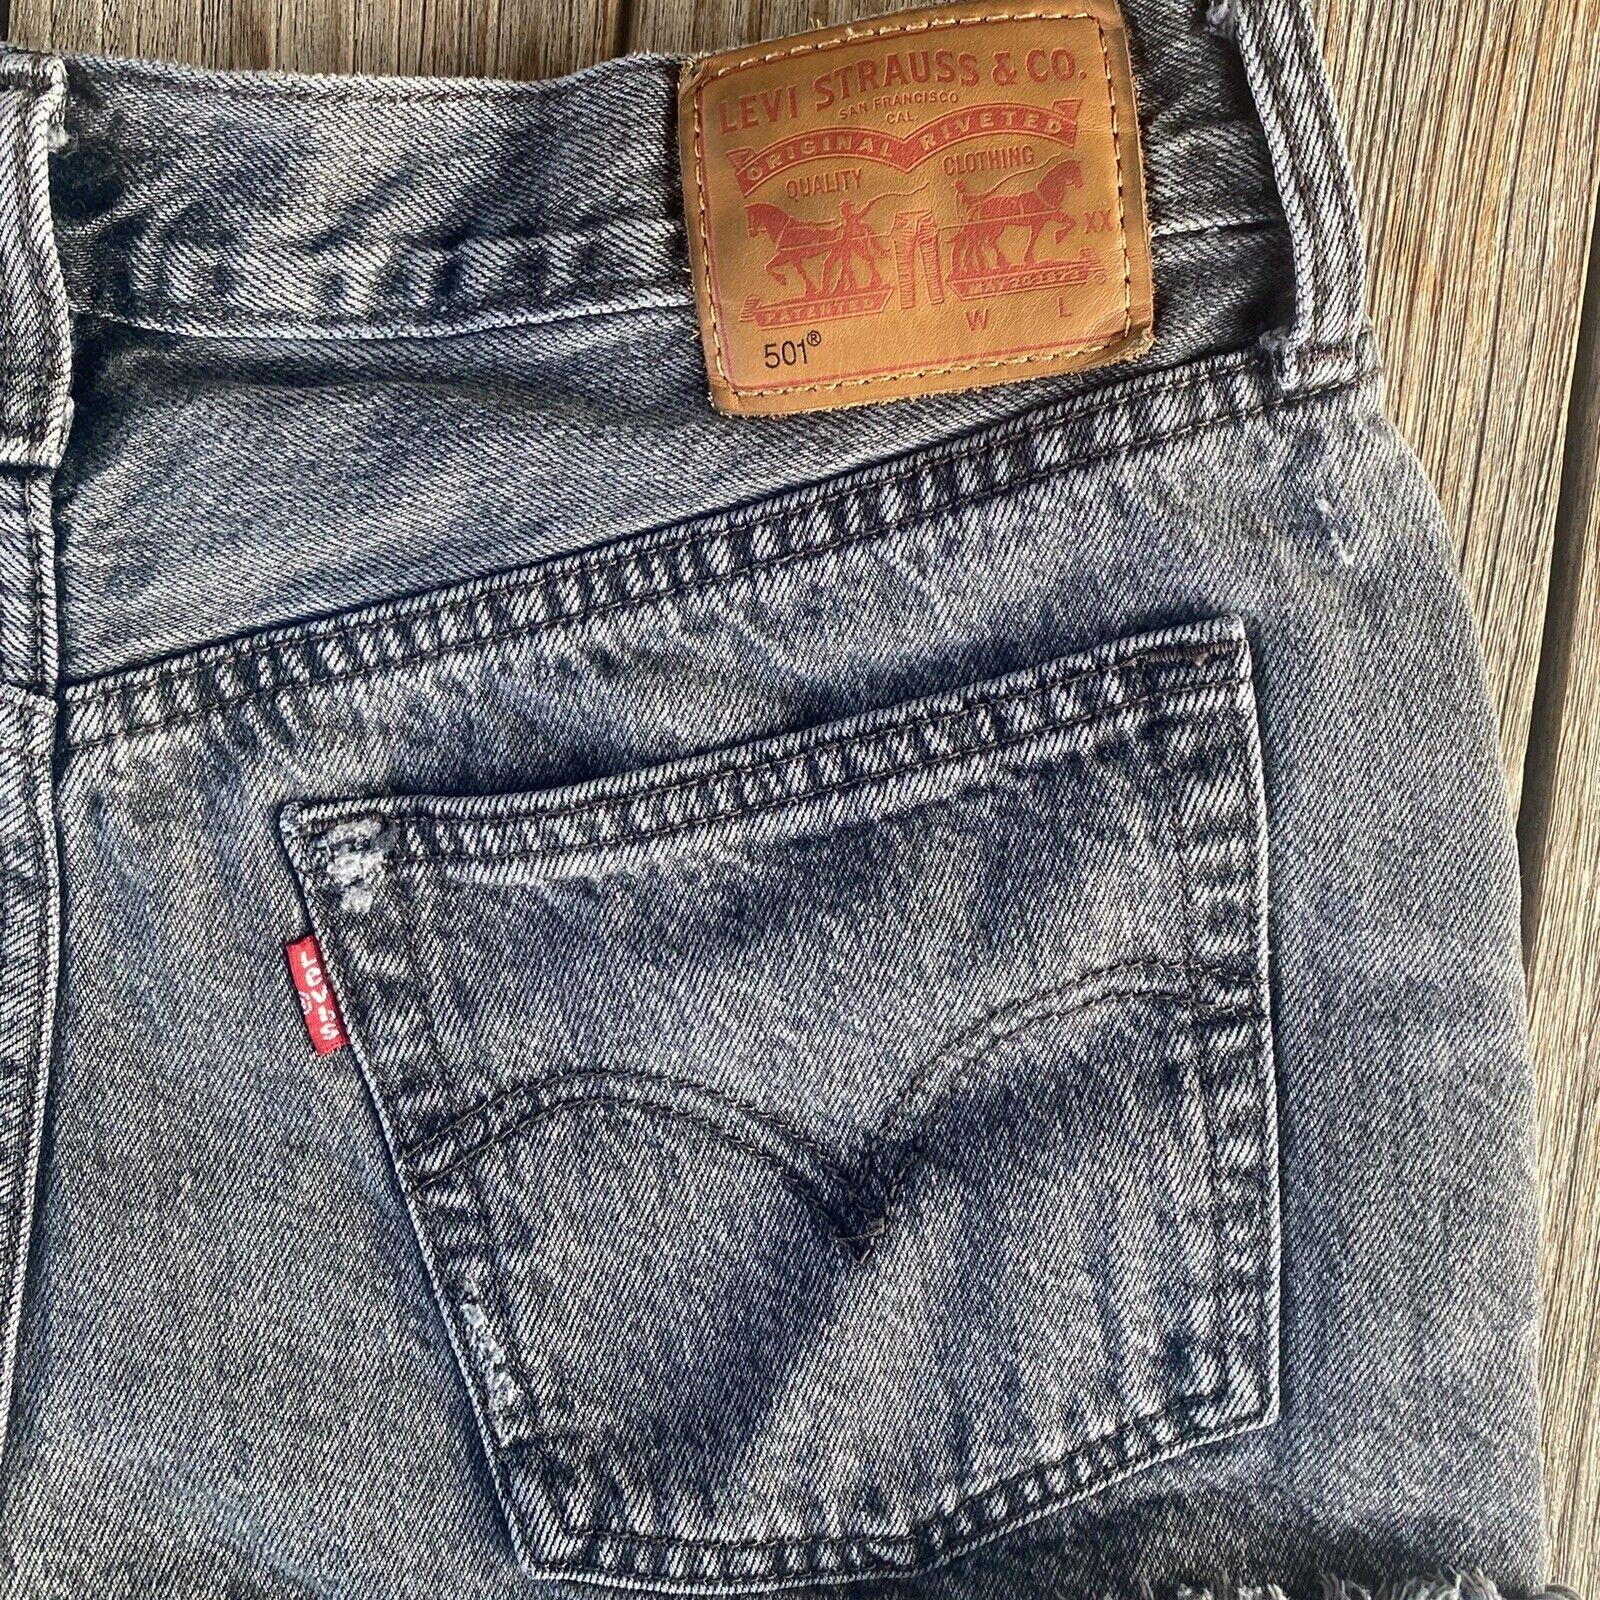 Vintage 90's Levi's 501 Distressed Denim Shorts S… - image 5